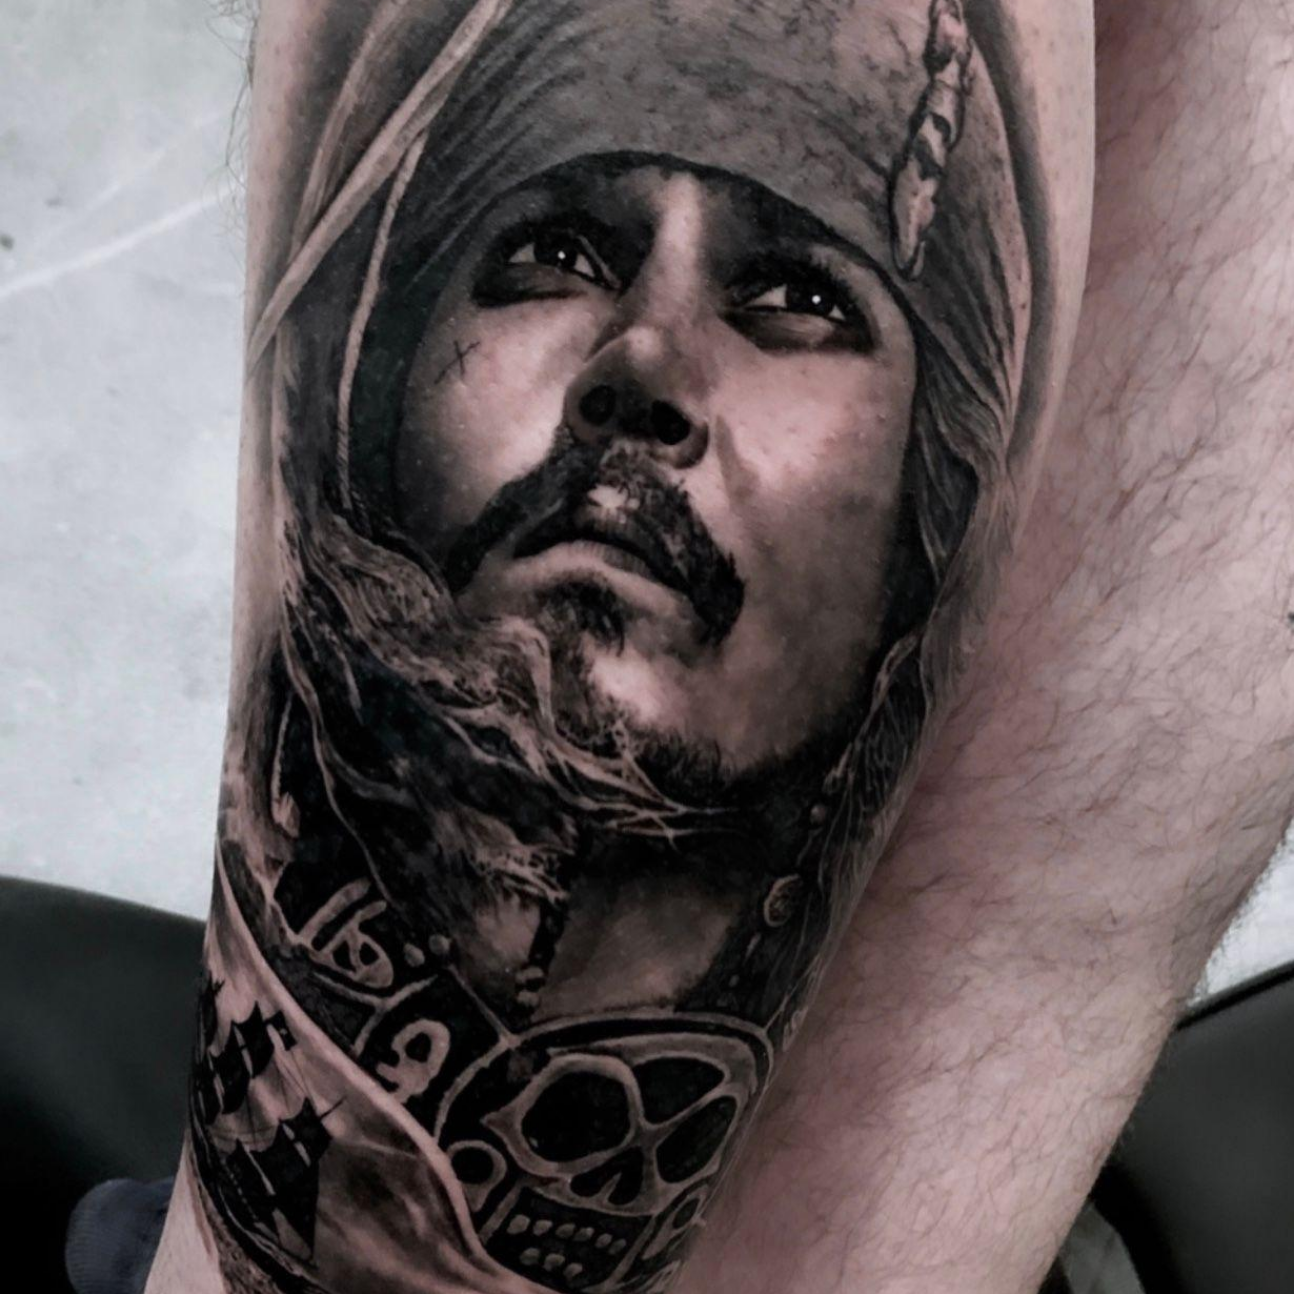 Tatuaggi-dispari-jack-sparrow-alt